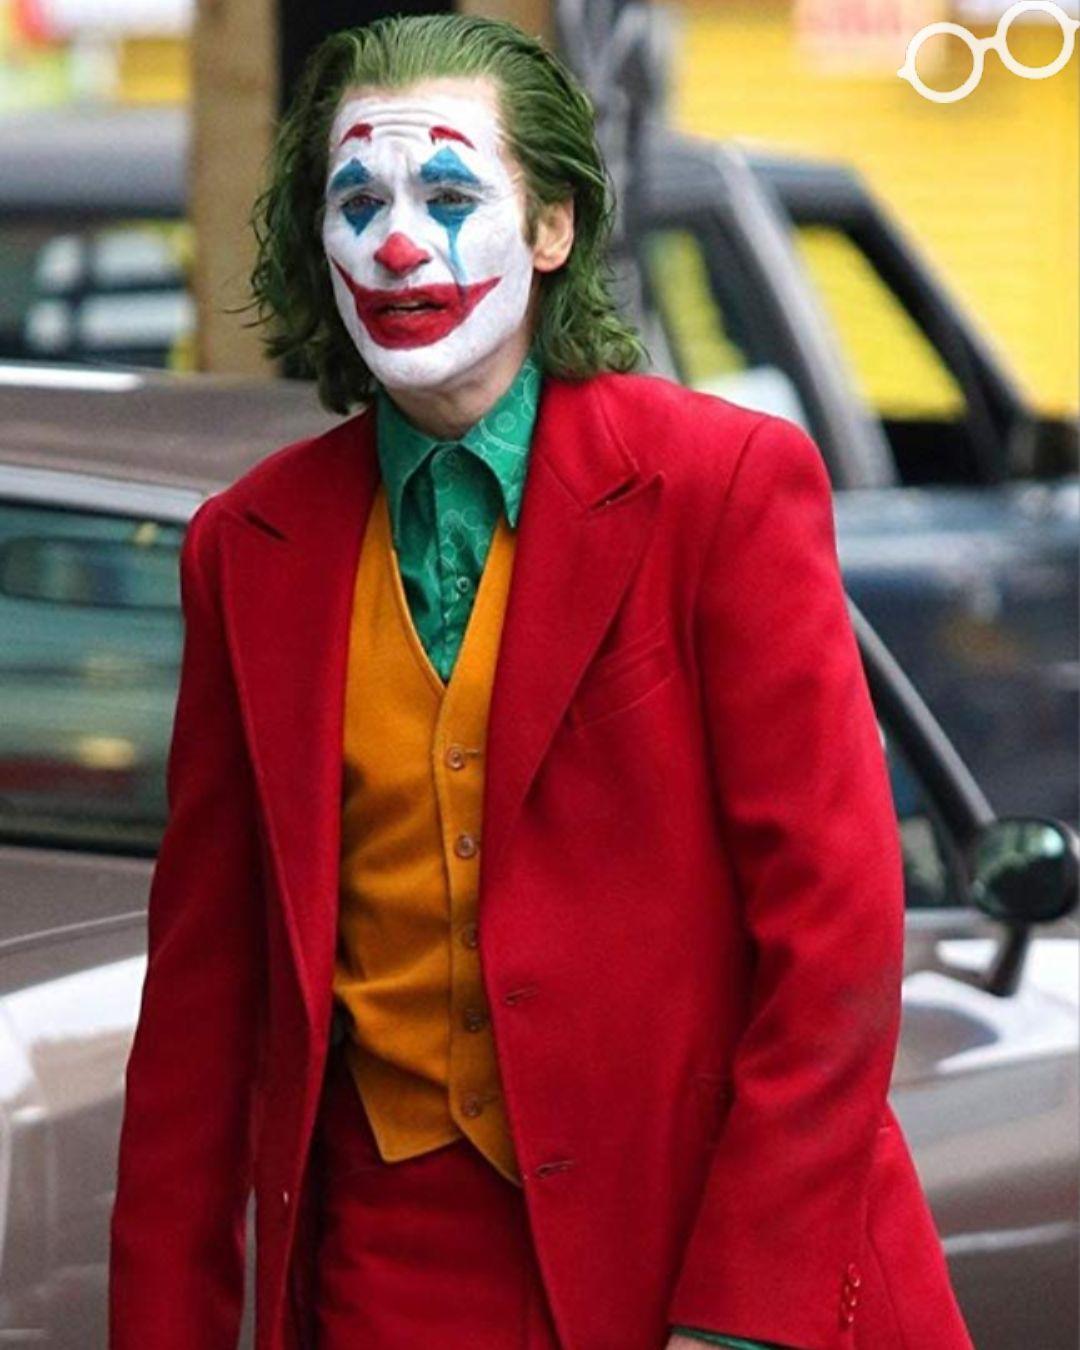 The Joker S Many Origin Stories Joker Suit Joker Face Joker Hd Wallpaper